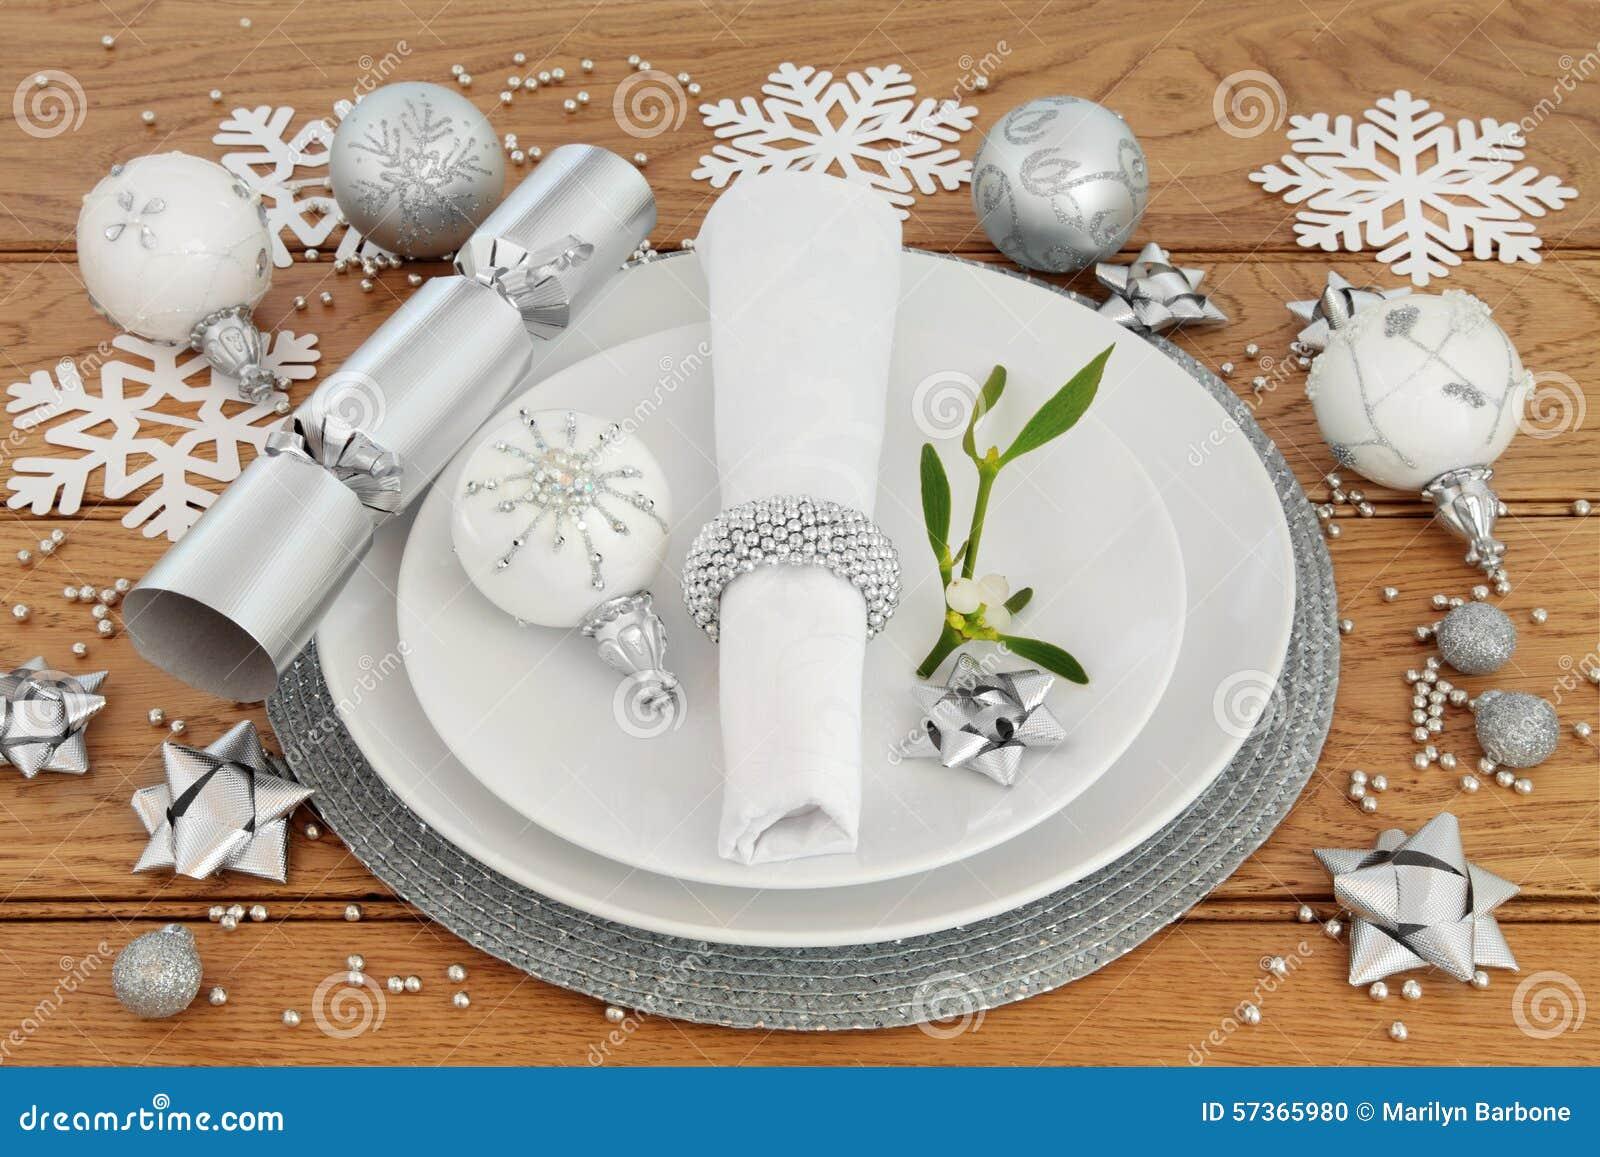 ... plates, napkin, bauble decorations, mistletoe over oak background